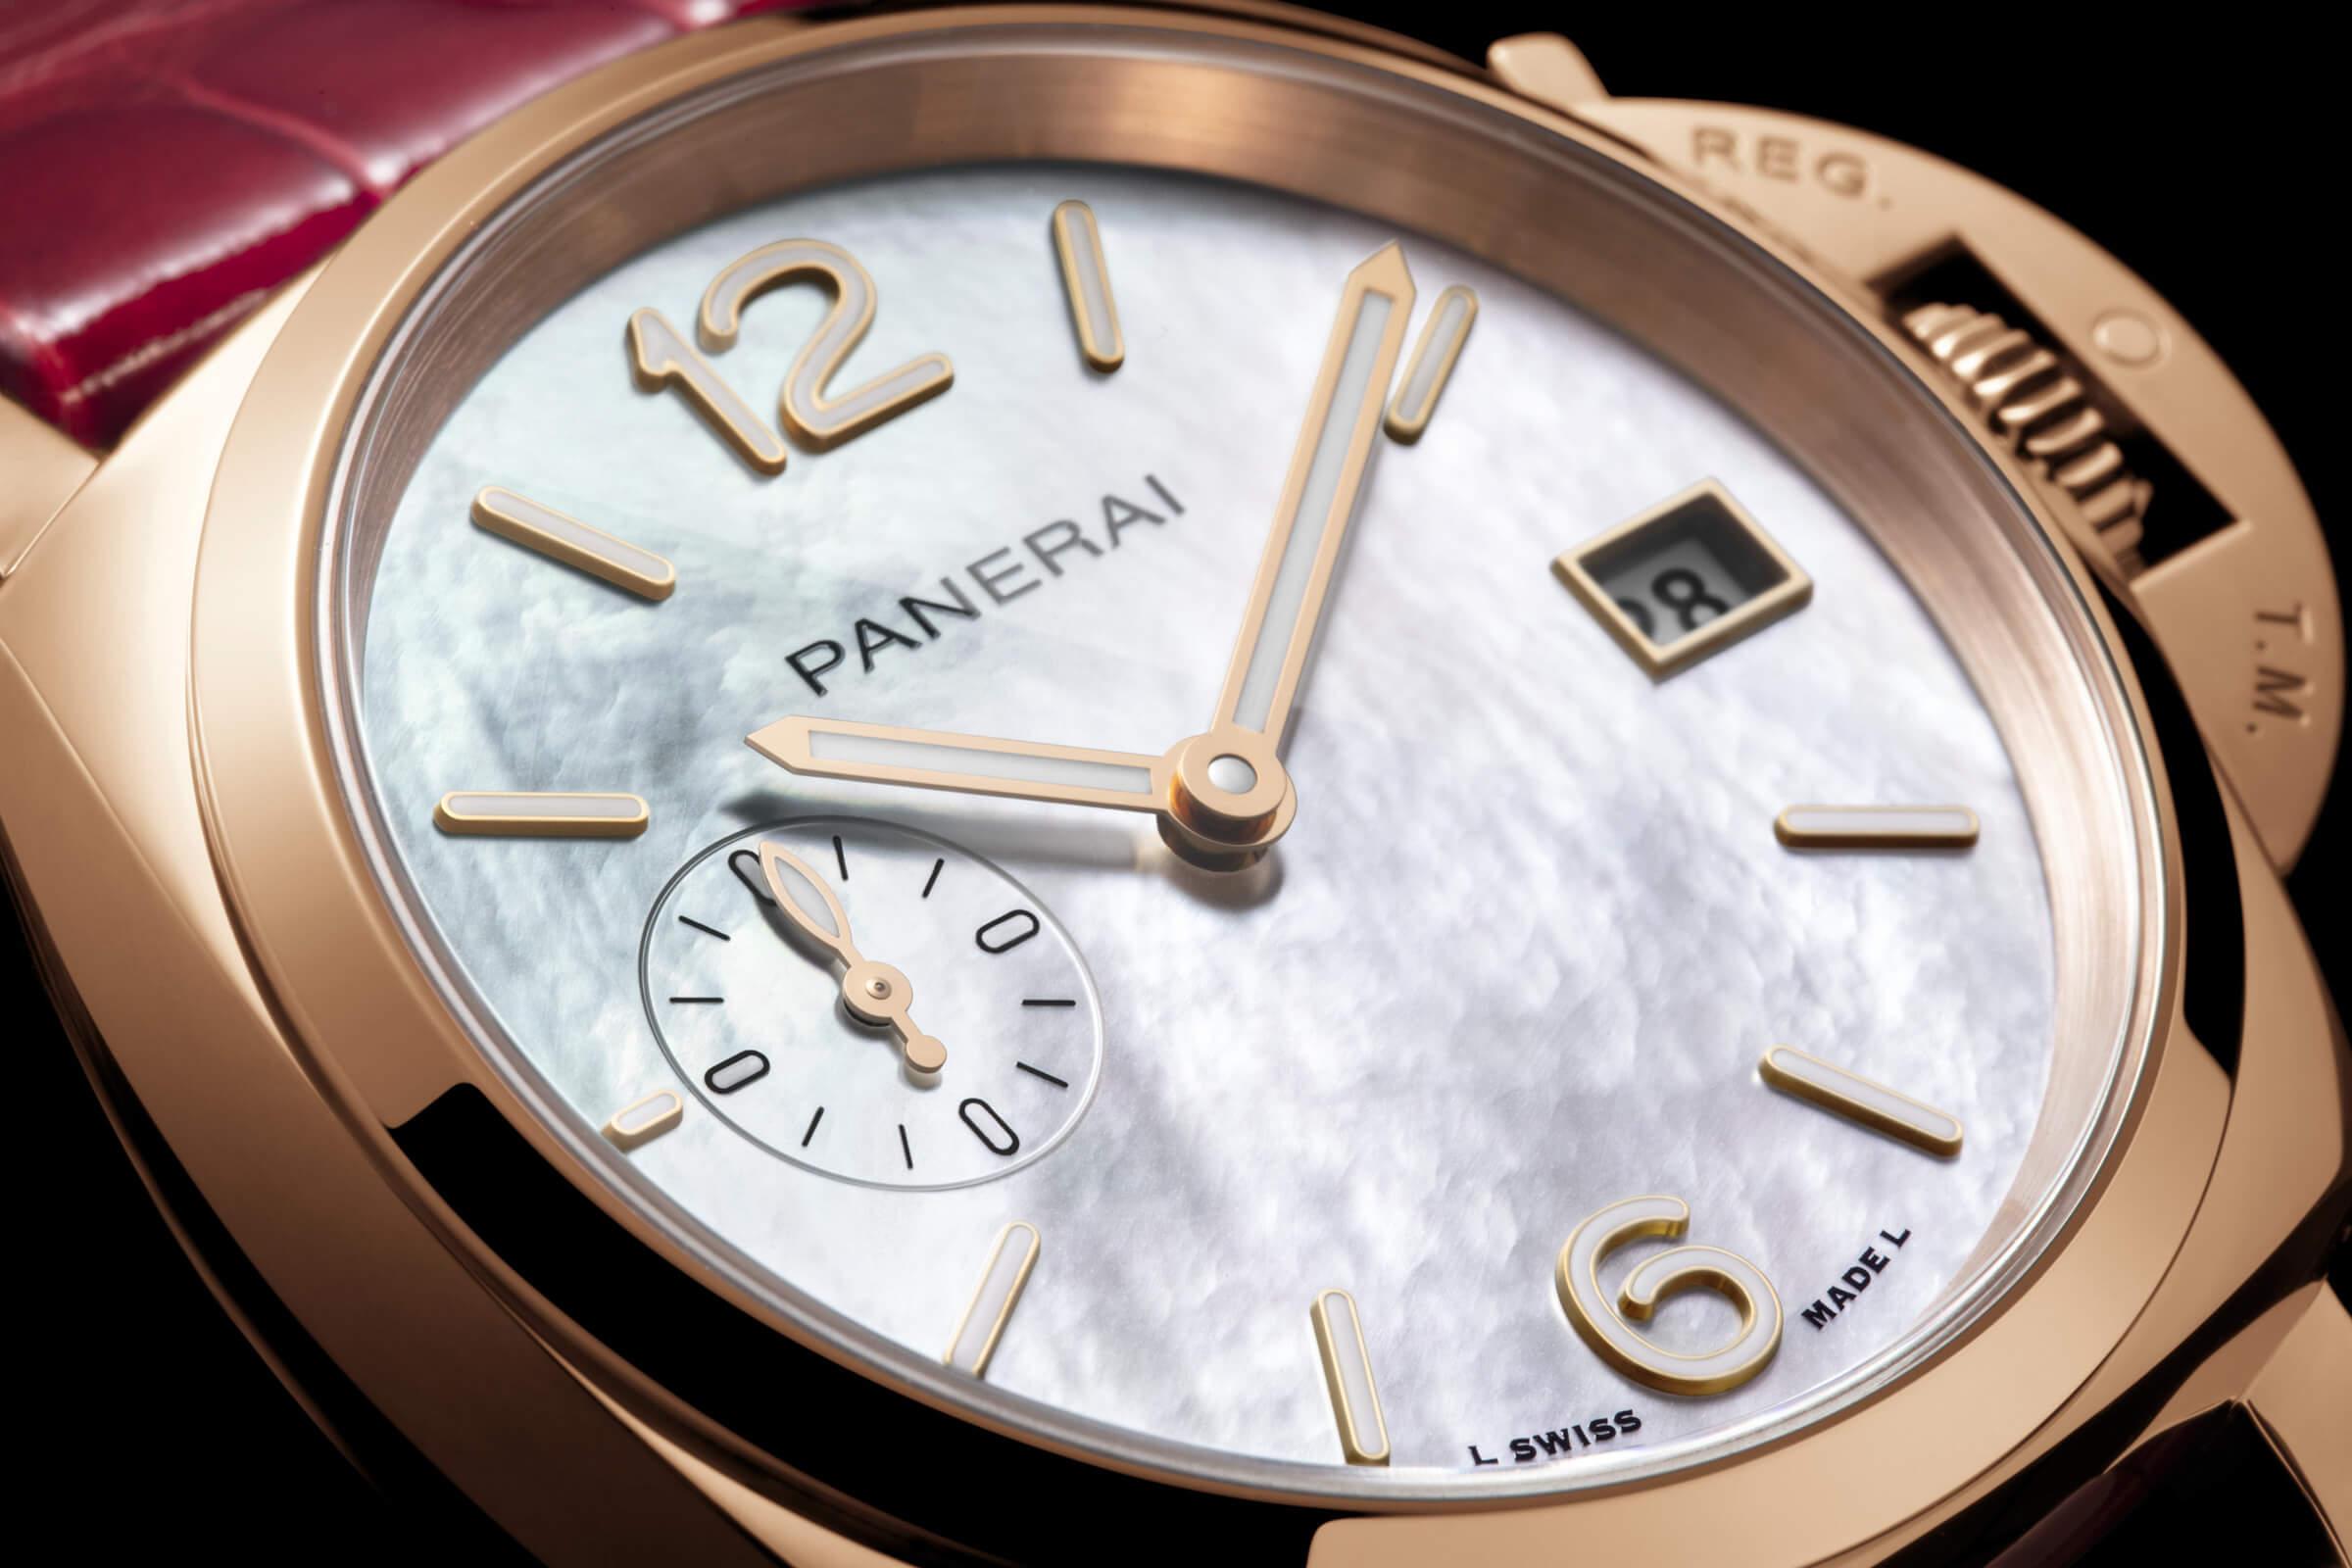 Watches & Wonders 2021 - Panerai novelties